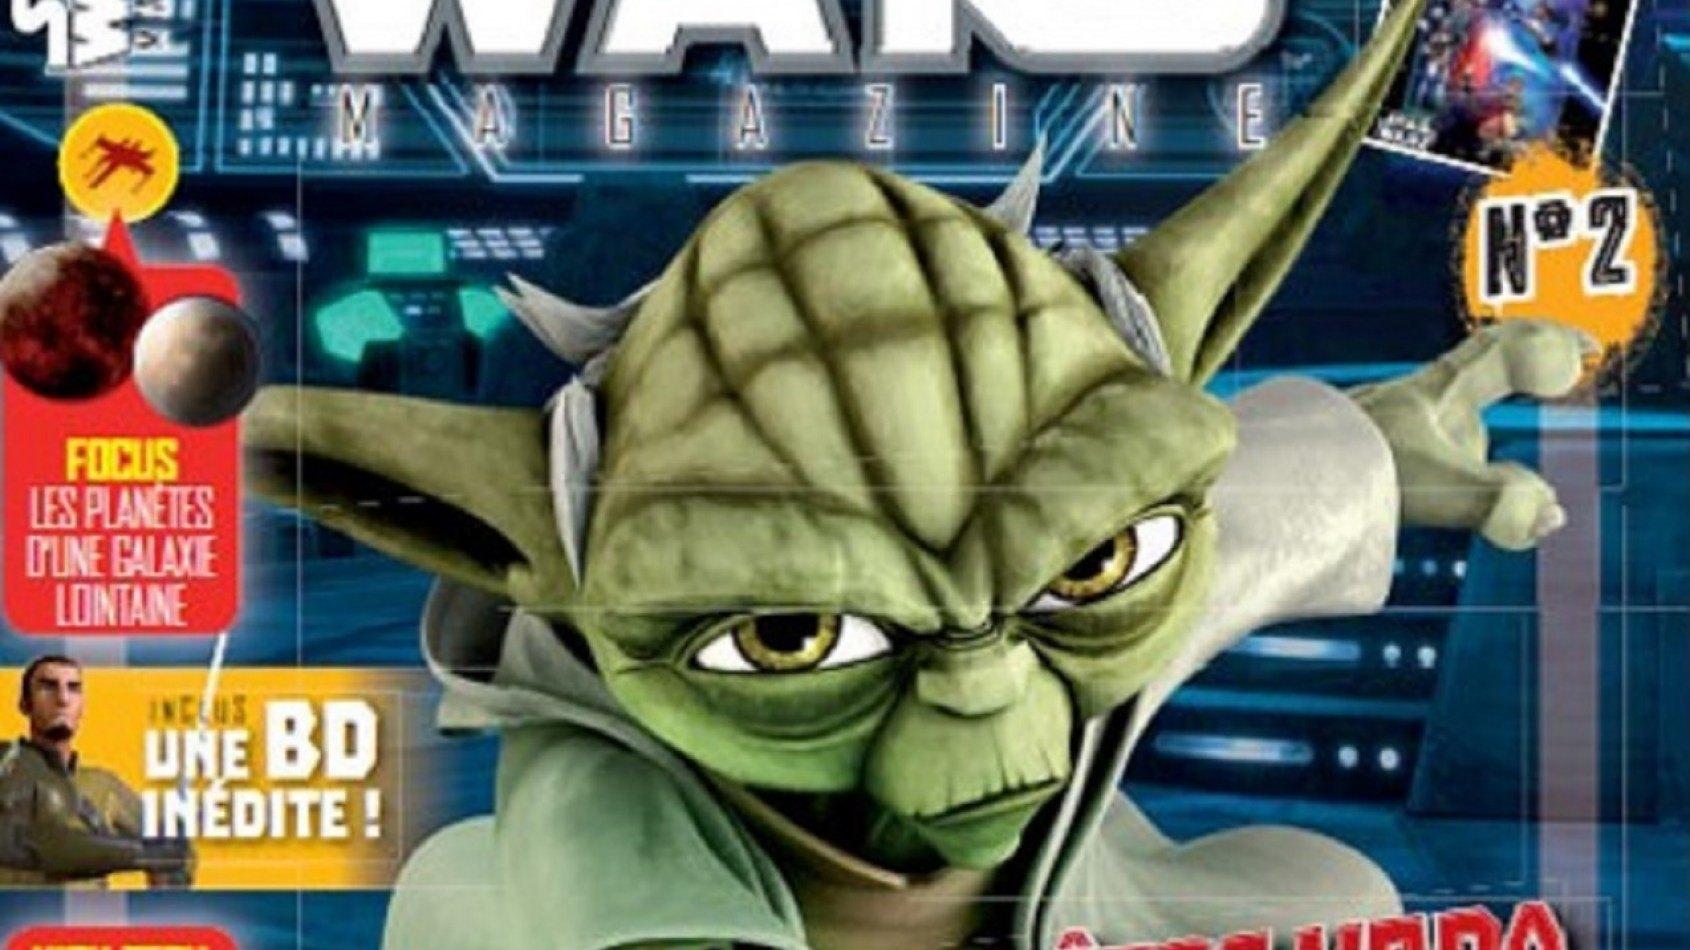 [Panini] Sortie de Star Wars Magazine 2